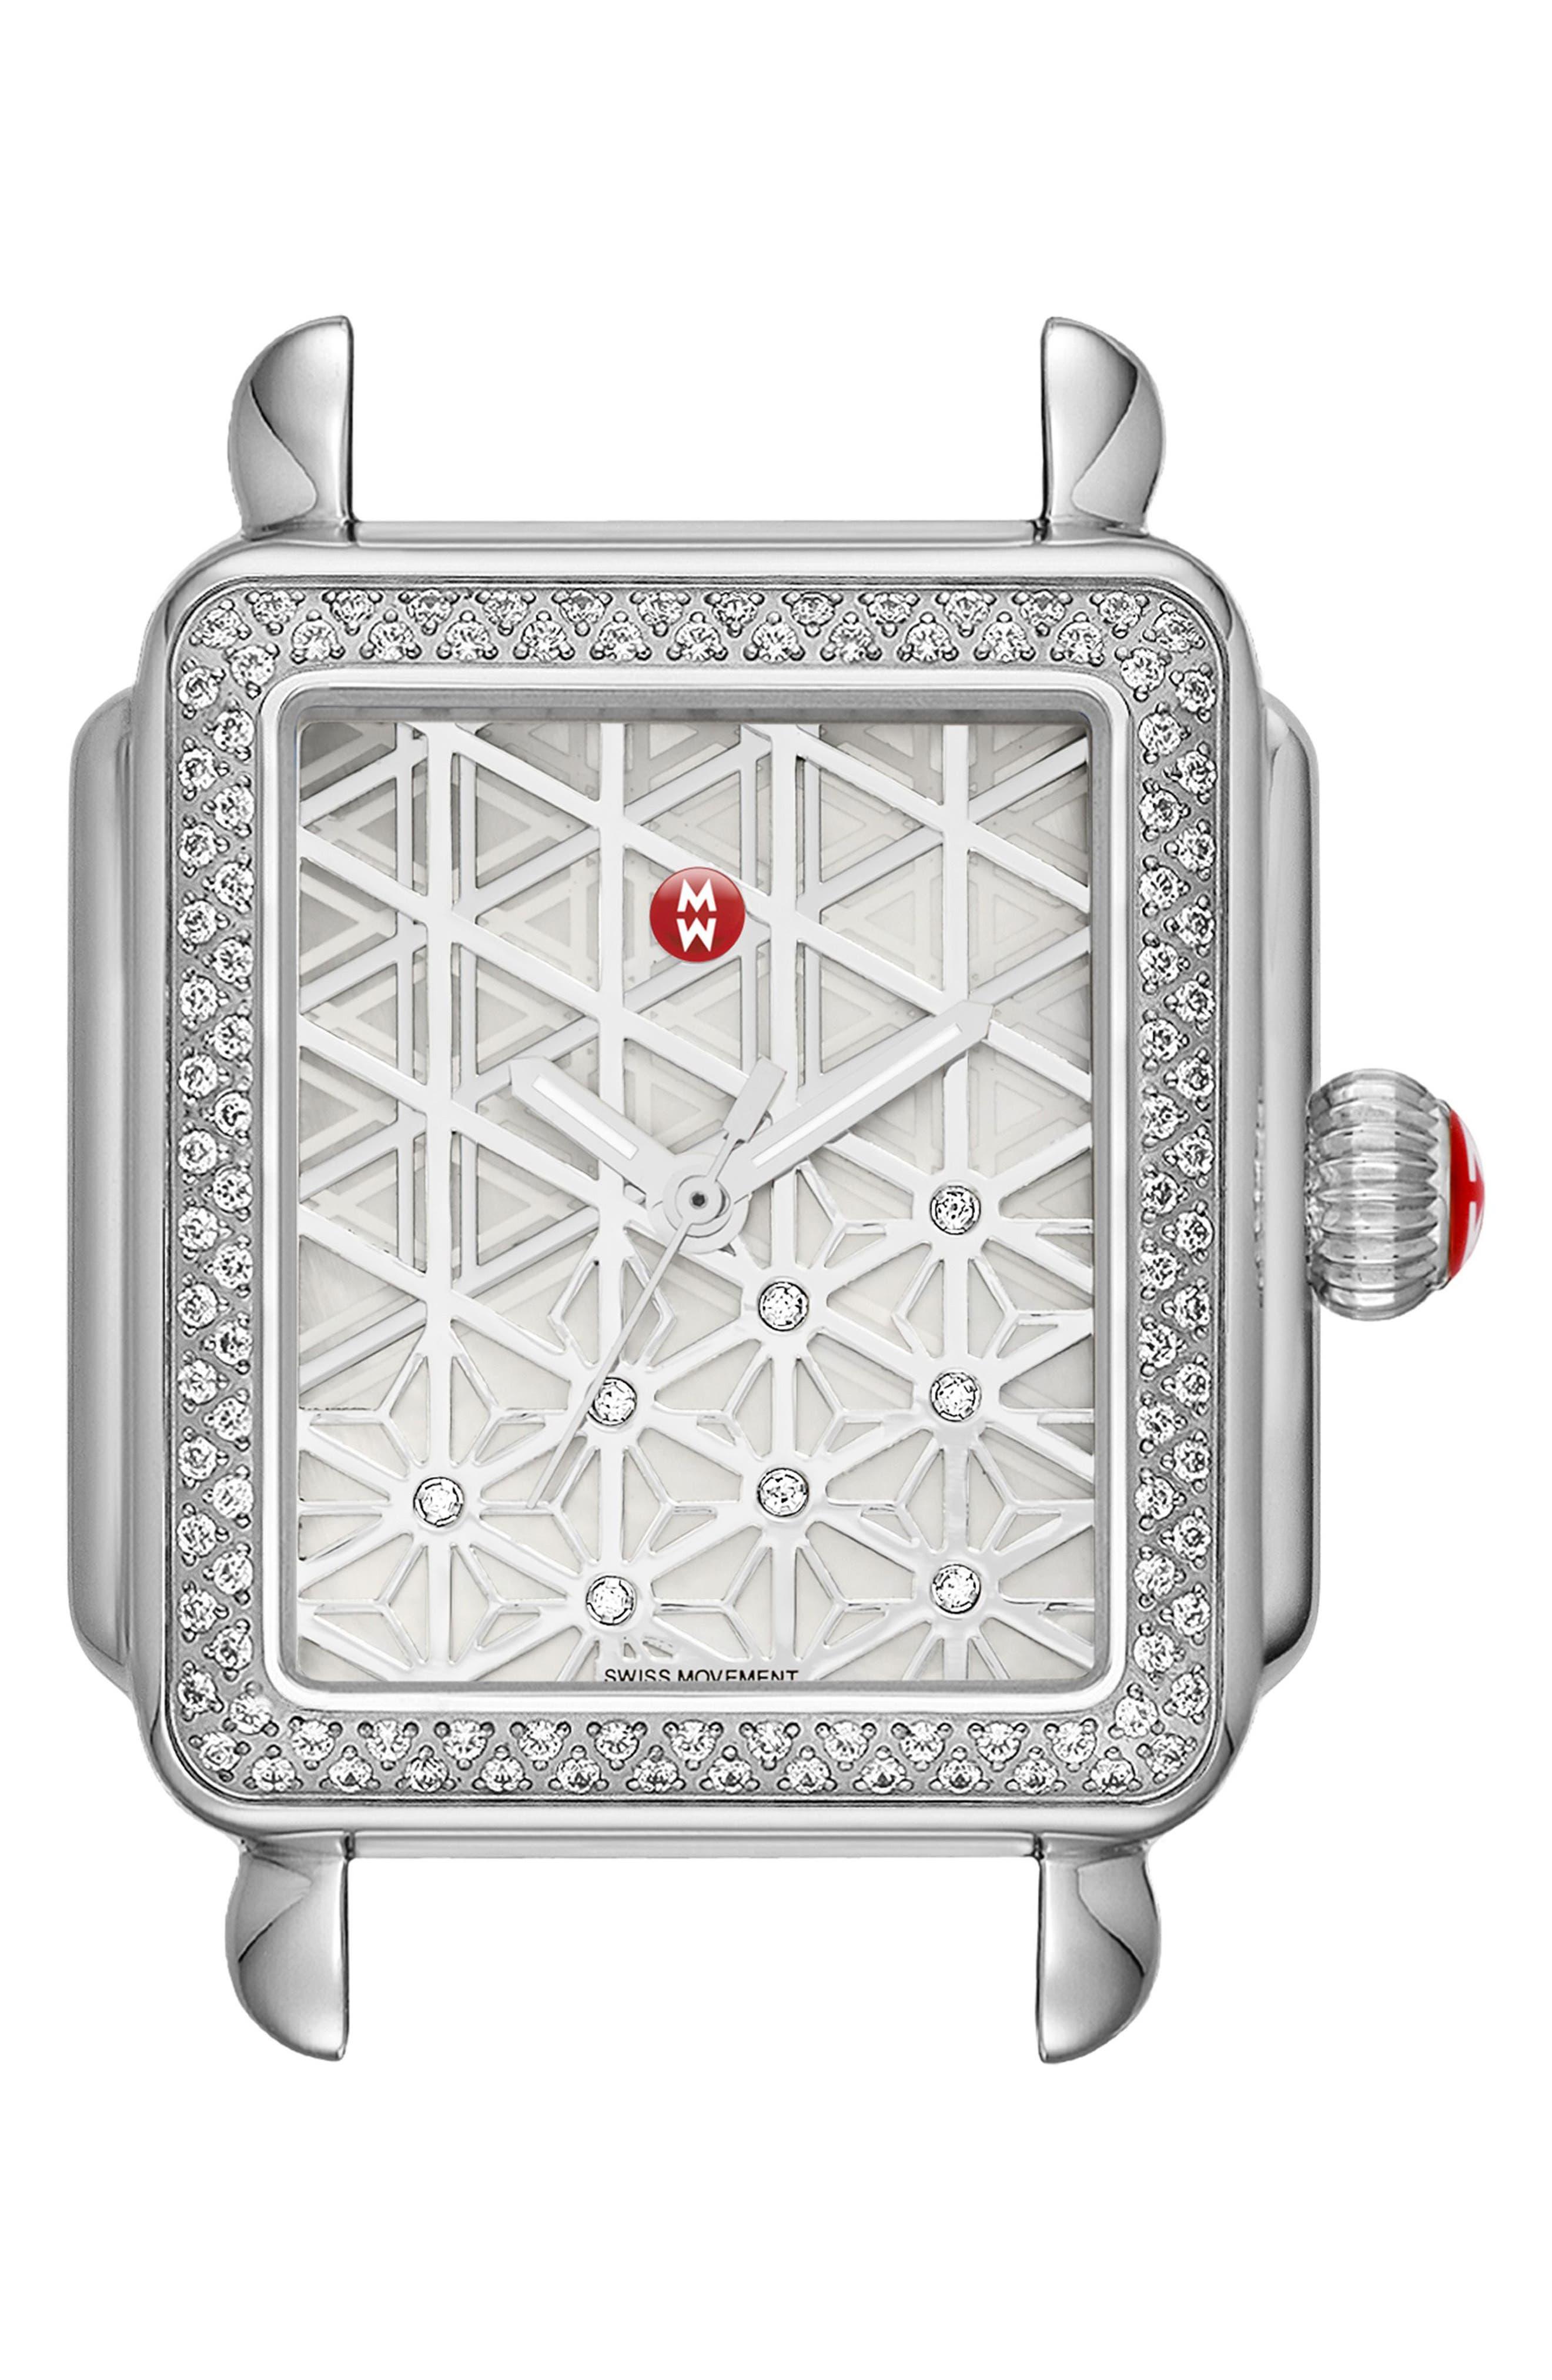 Main Image - MICHELE Deco Diamond Diamond Dial Watch Case, 33mm x 35mm